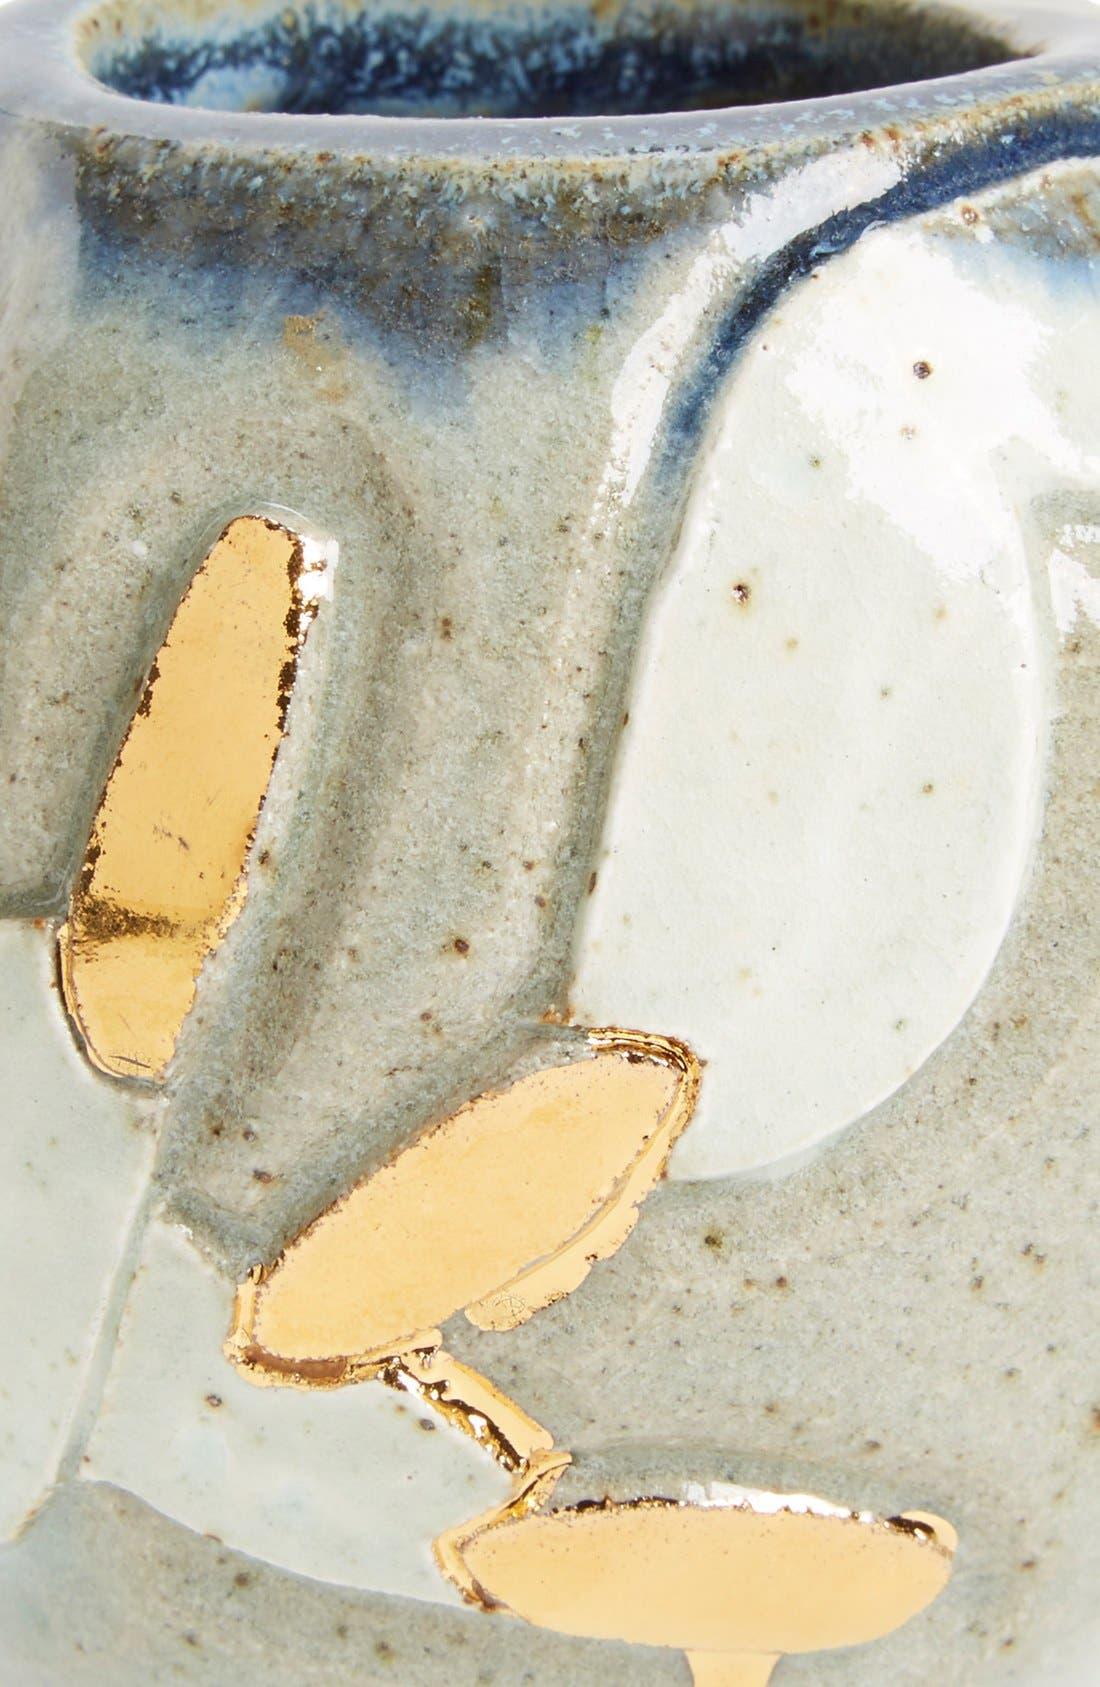 Alternate Image 2  - BZIPPY & CO. 'Nails' Handmade Ceramic Vase